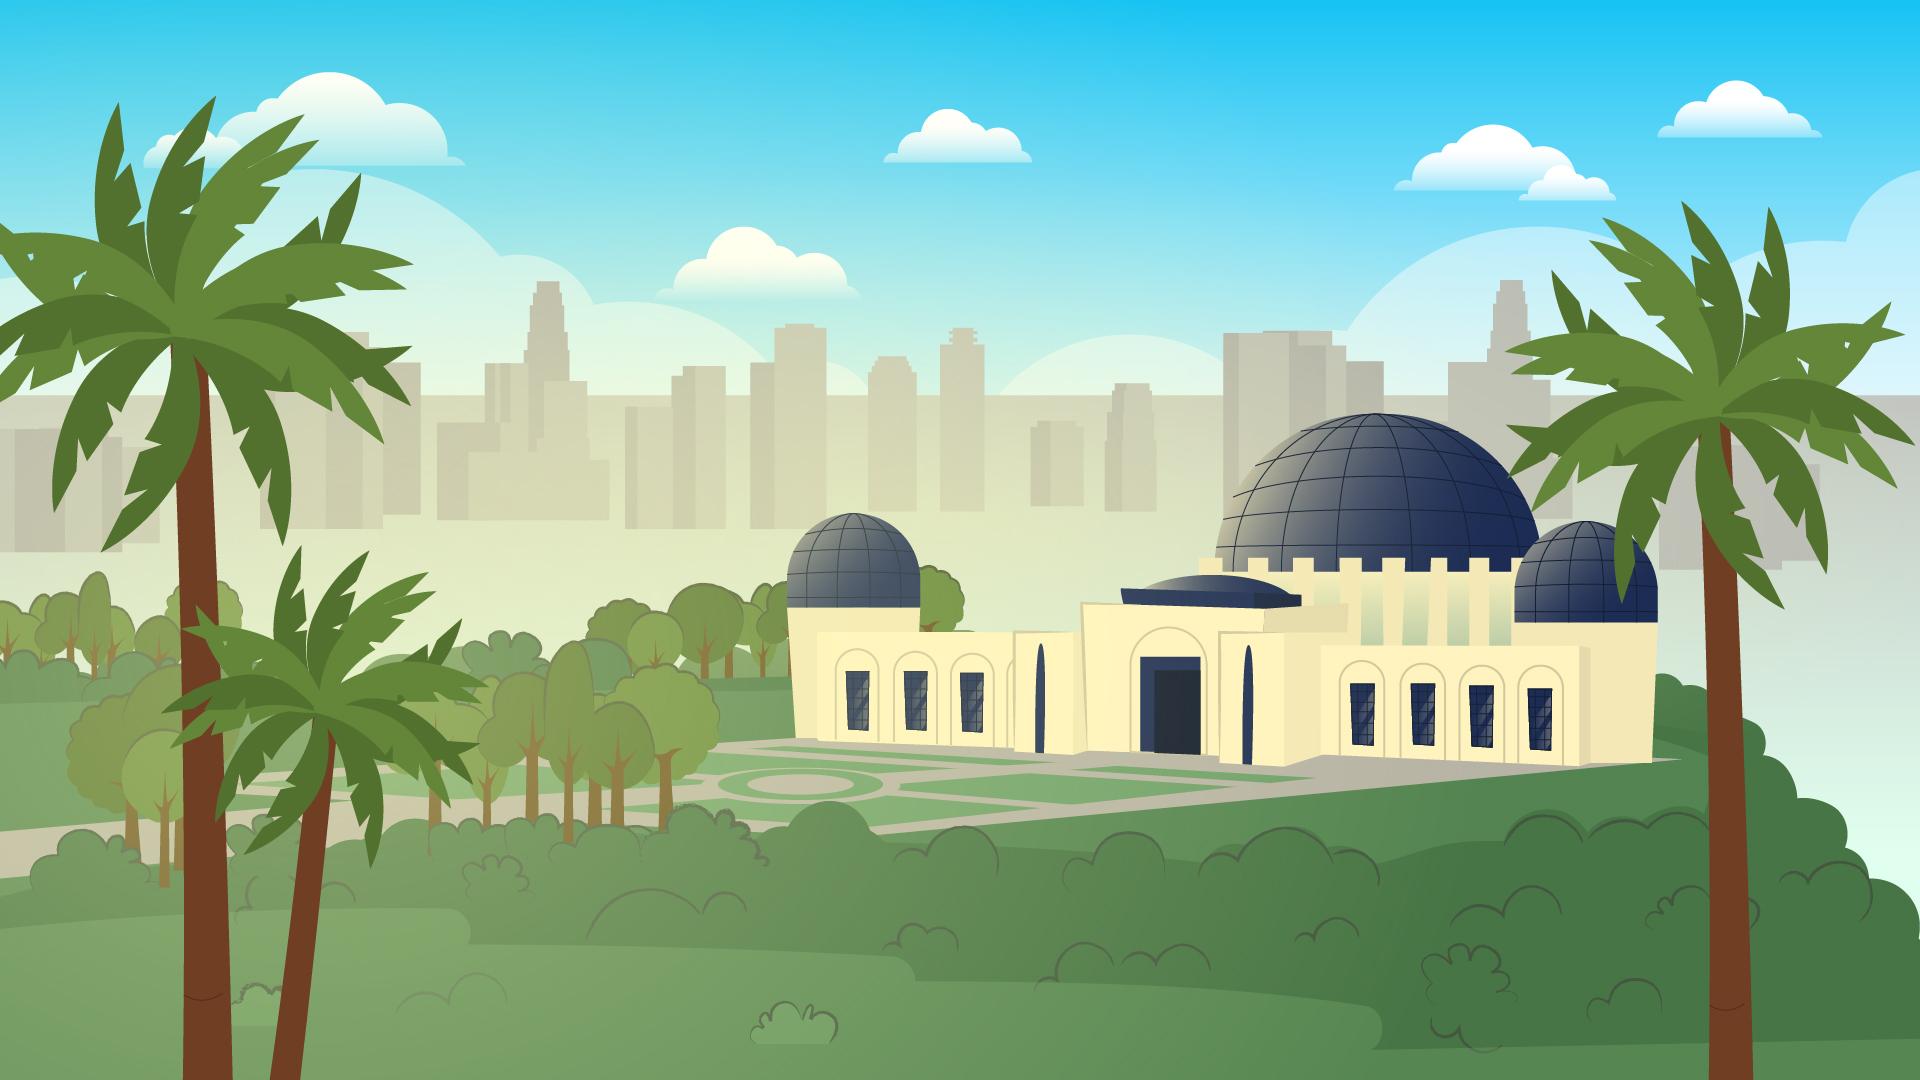 Building - Animation